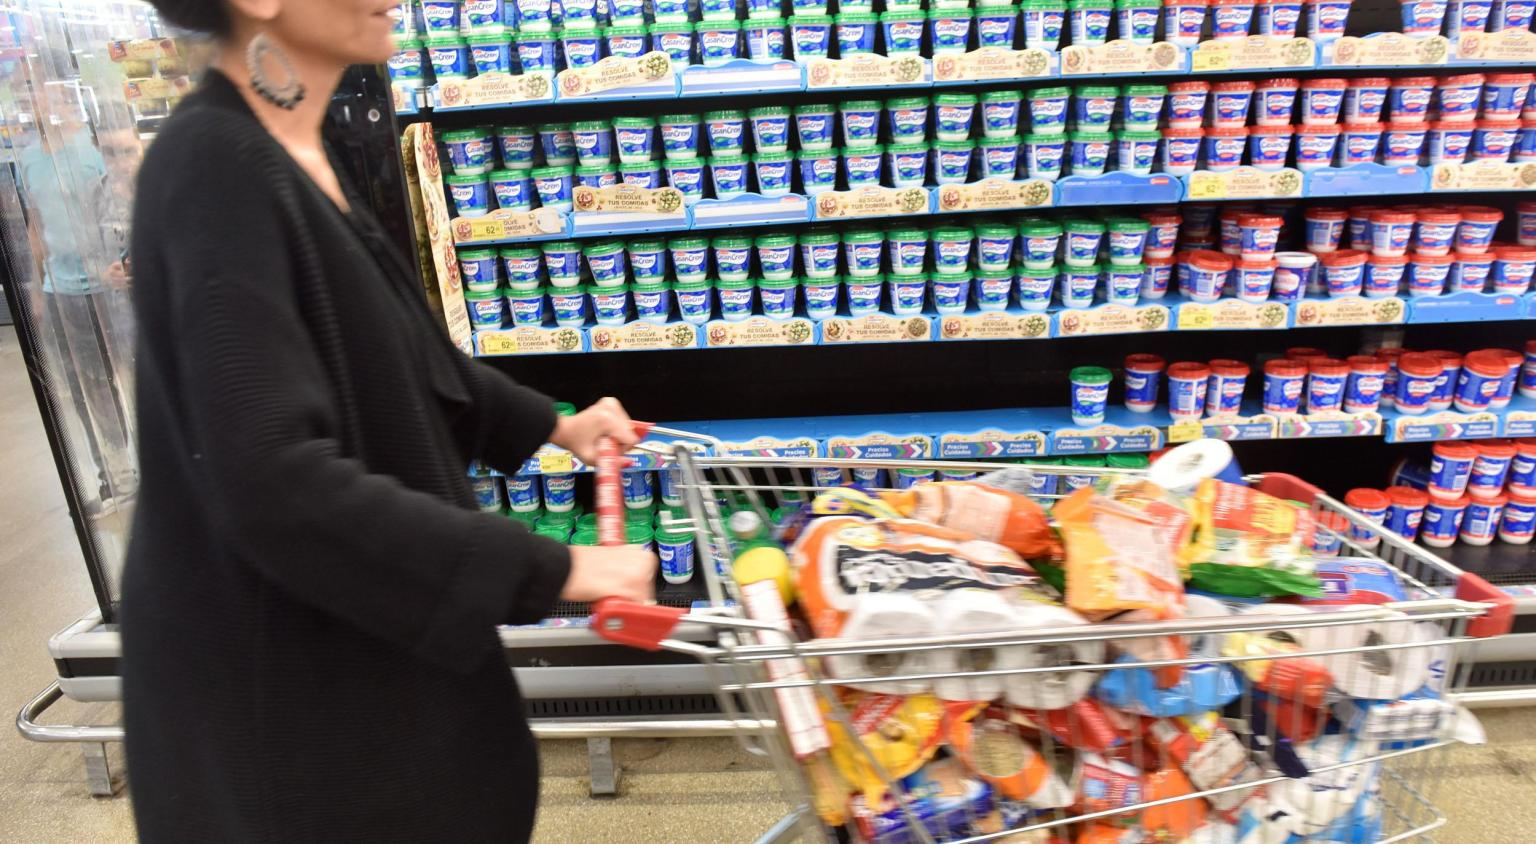 consumidores argentinos